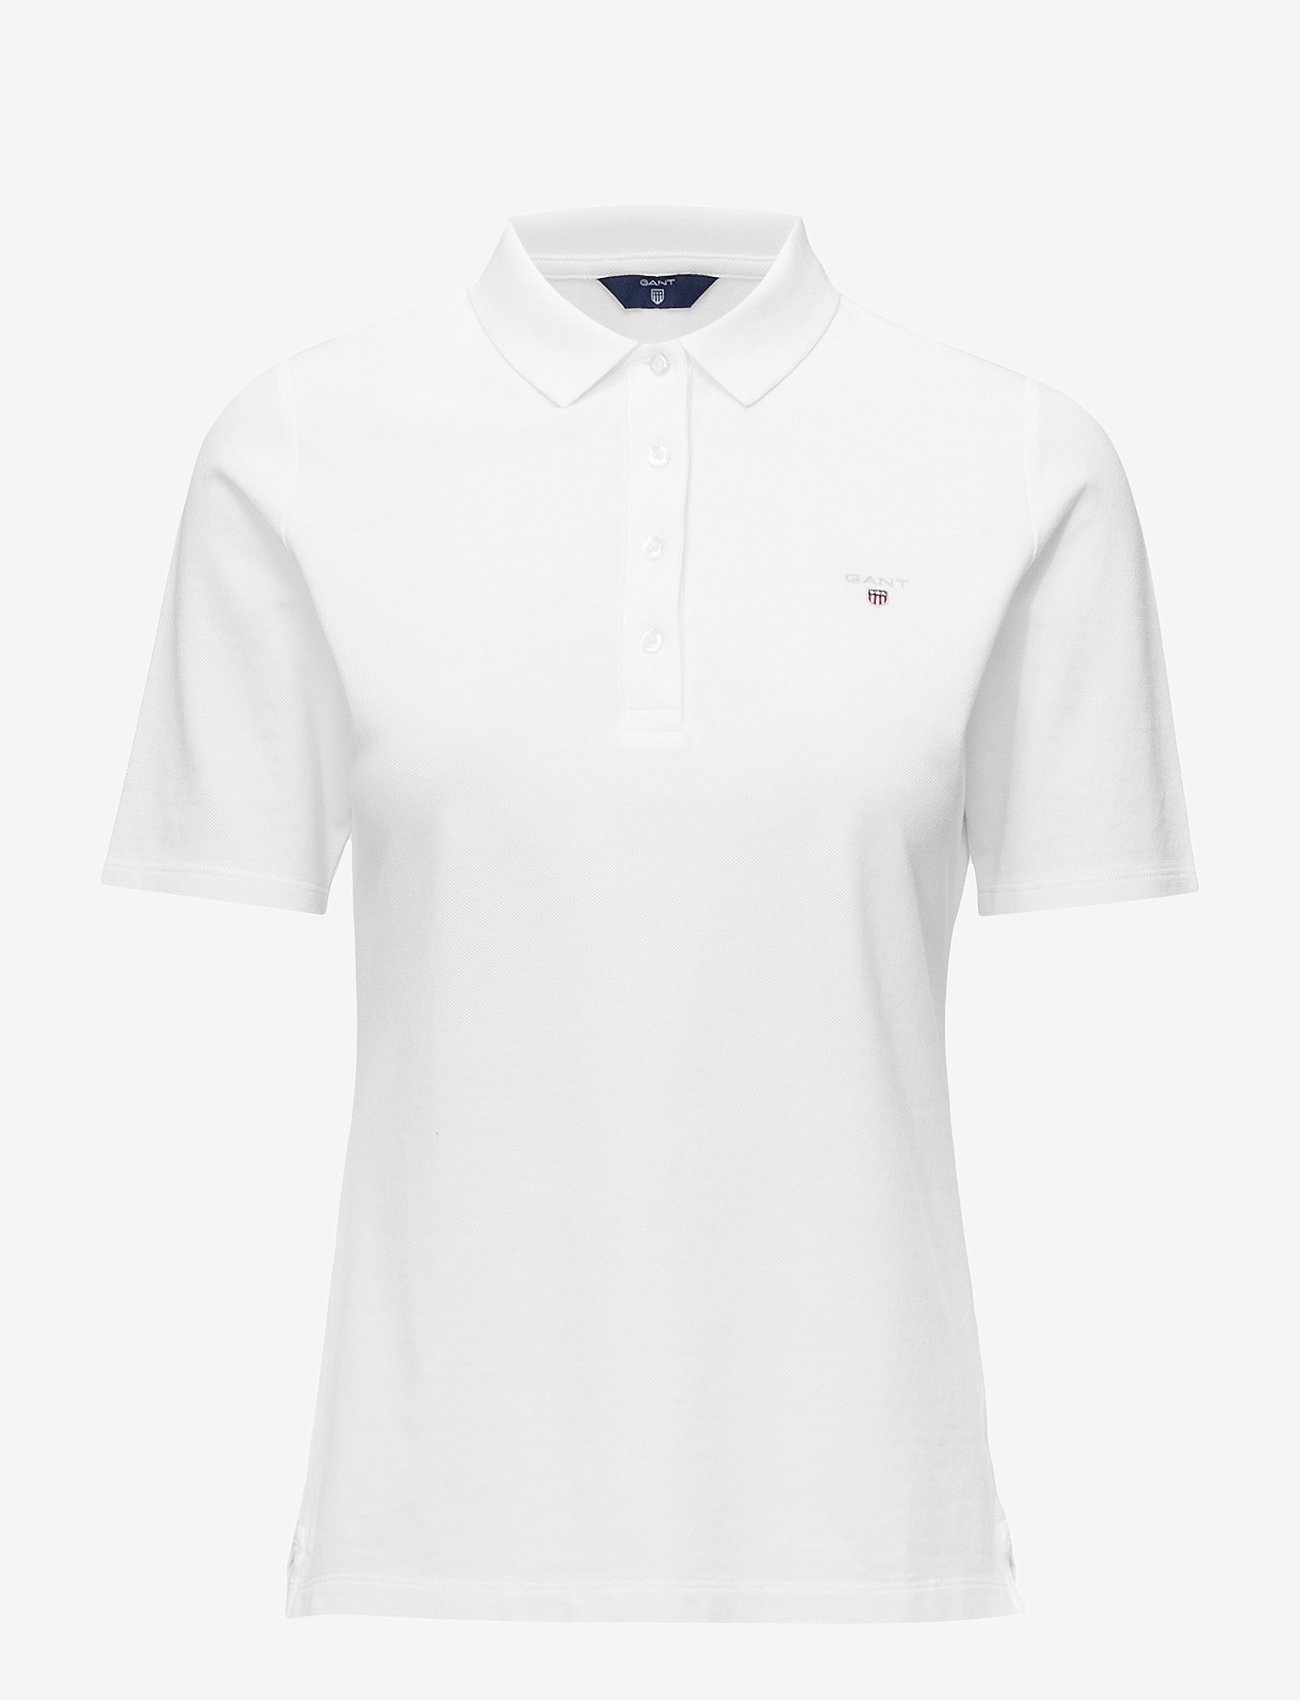 GANT - THE ORIGINAL PIQUE LSS - polo shirts - white - 0